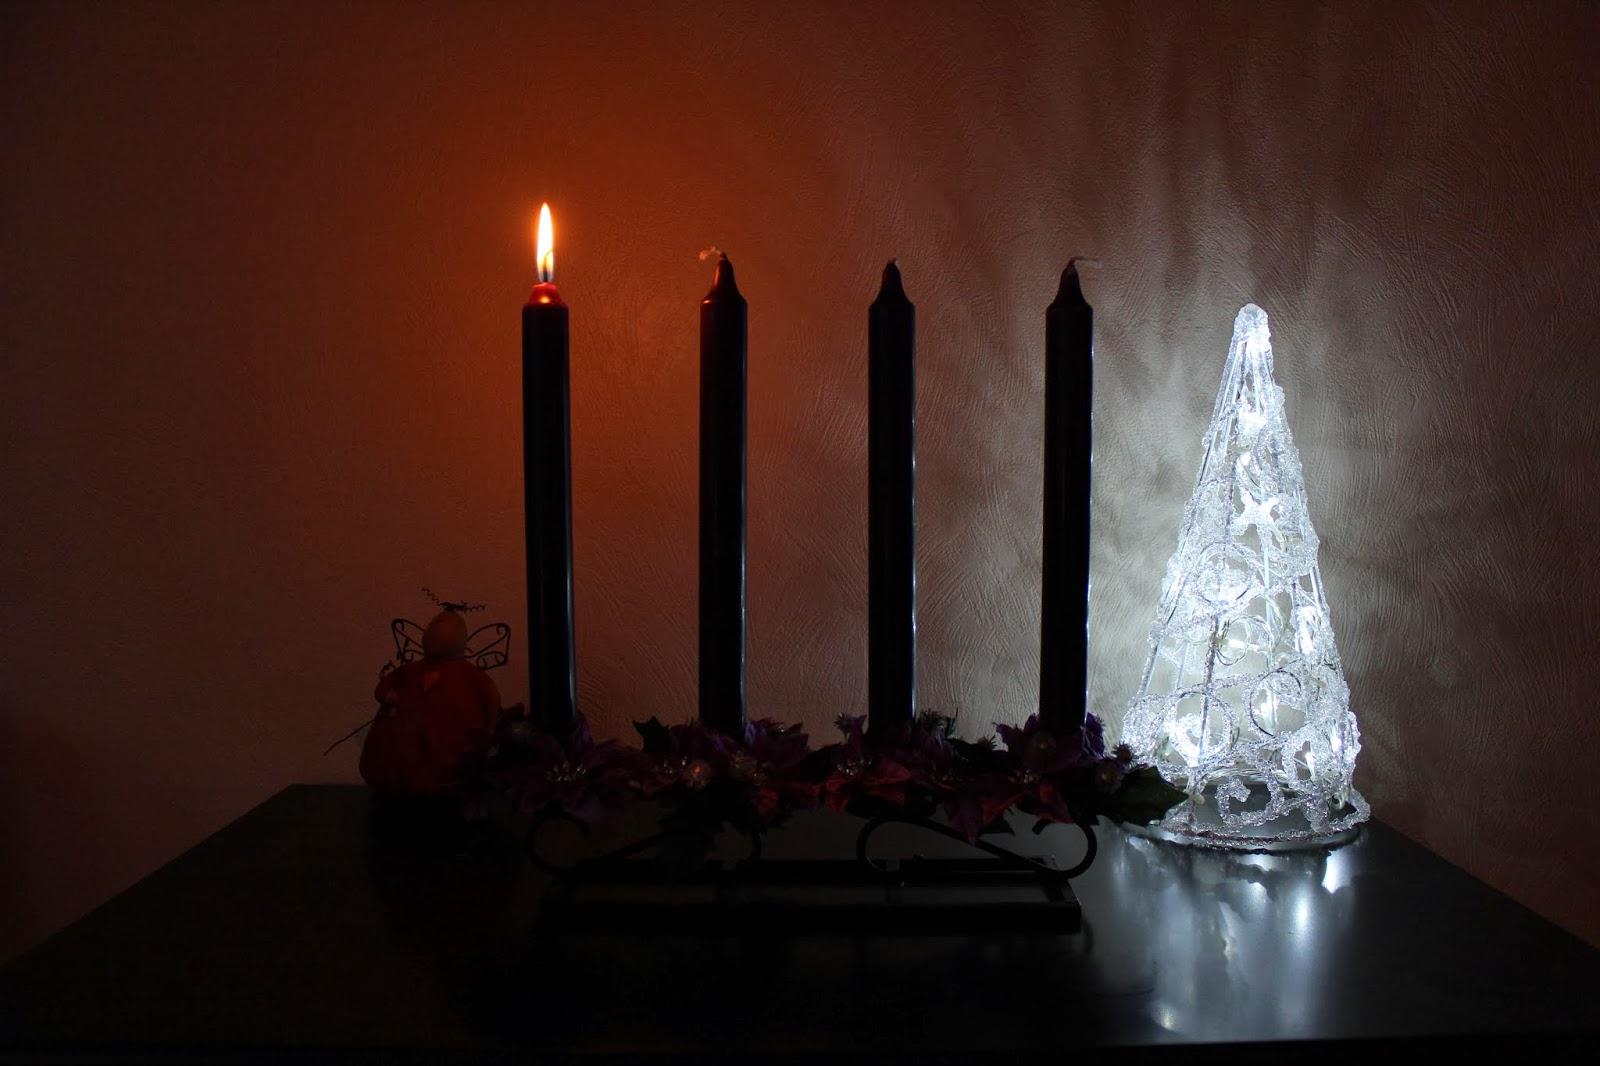 wenches sm strikk s tenner vi et lys i kveld. Black Bedroom Furniture Sets. Home Design Ideas